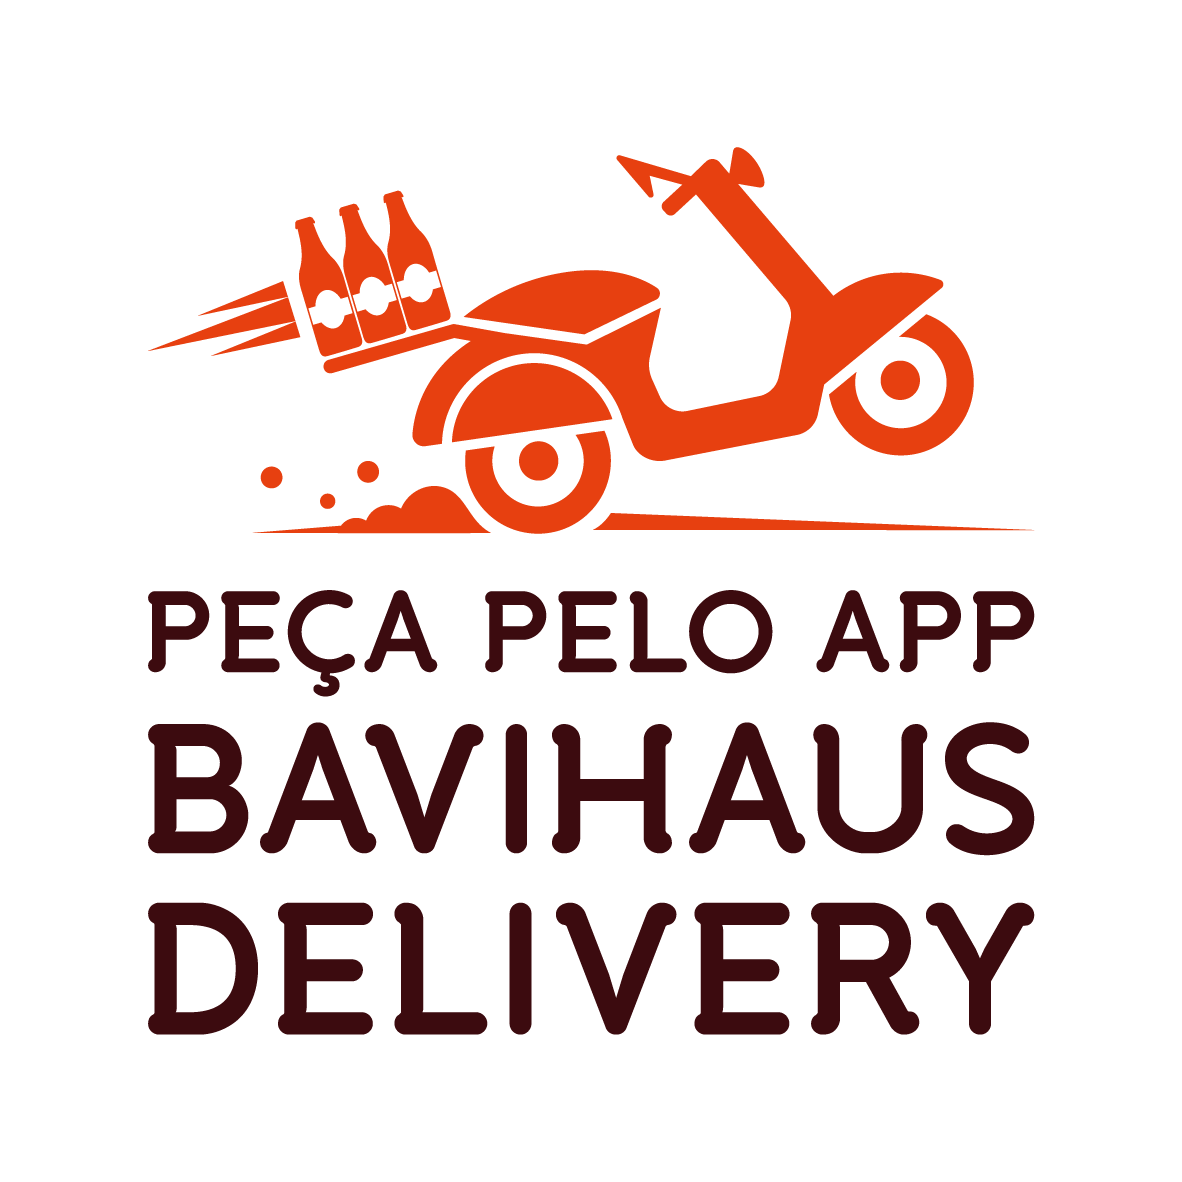 Bavihaus Delivery - Baixe já o aplicativo!